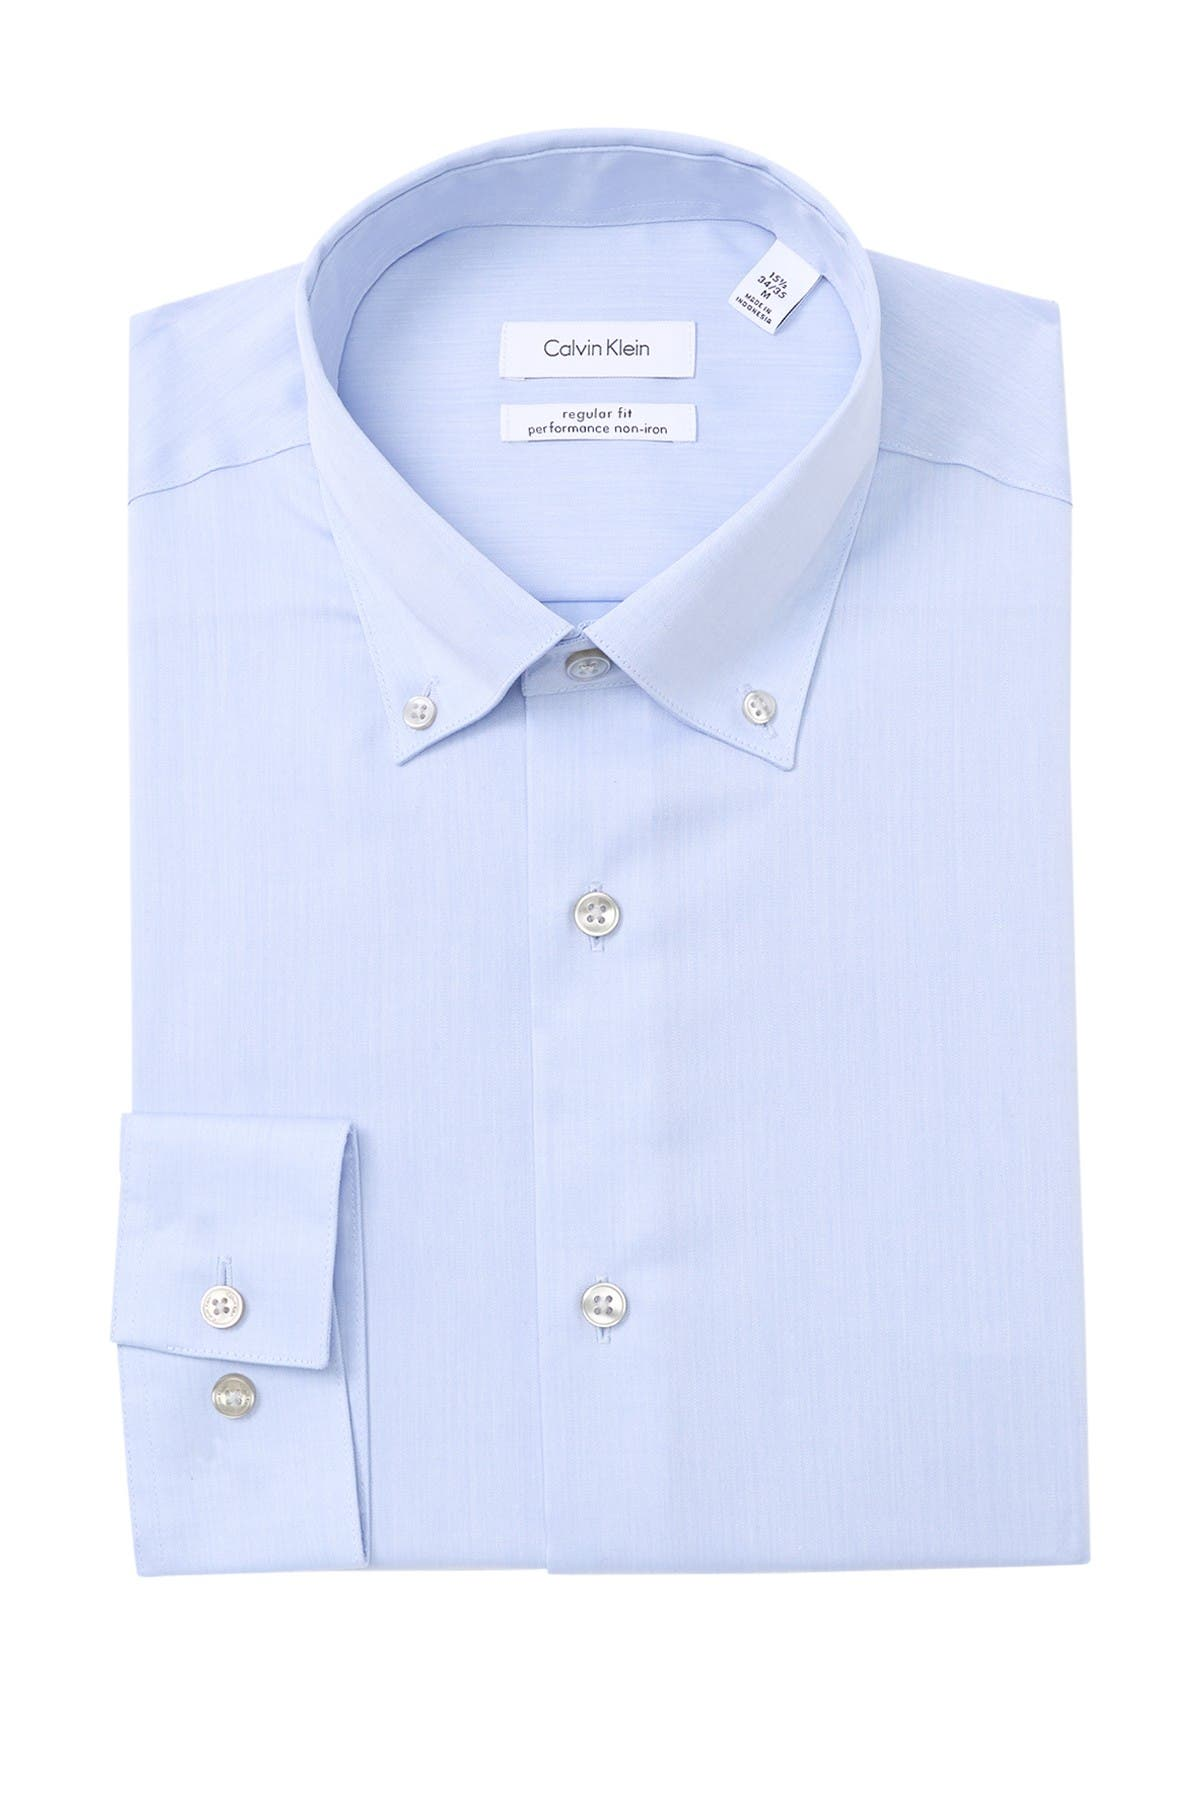 Image of Calvin Klein Slim Fit Dress Shirt